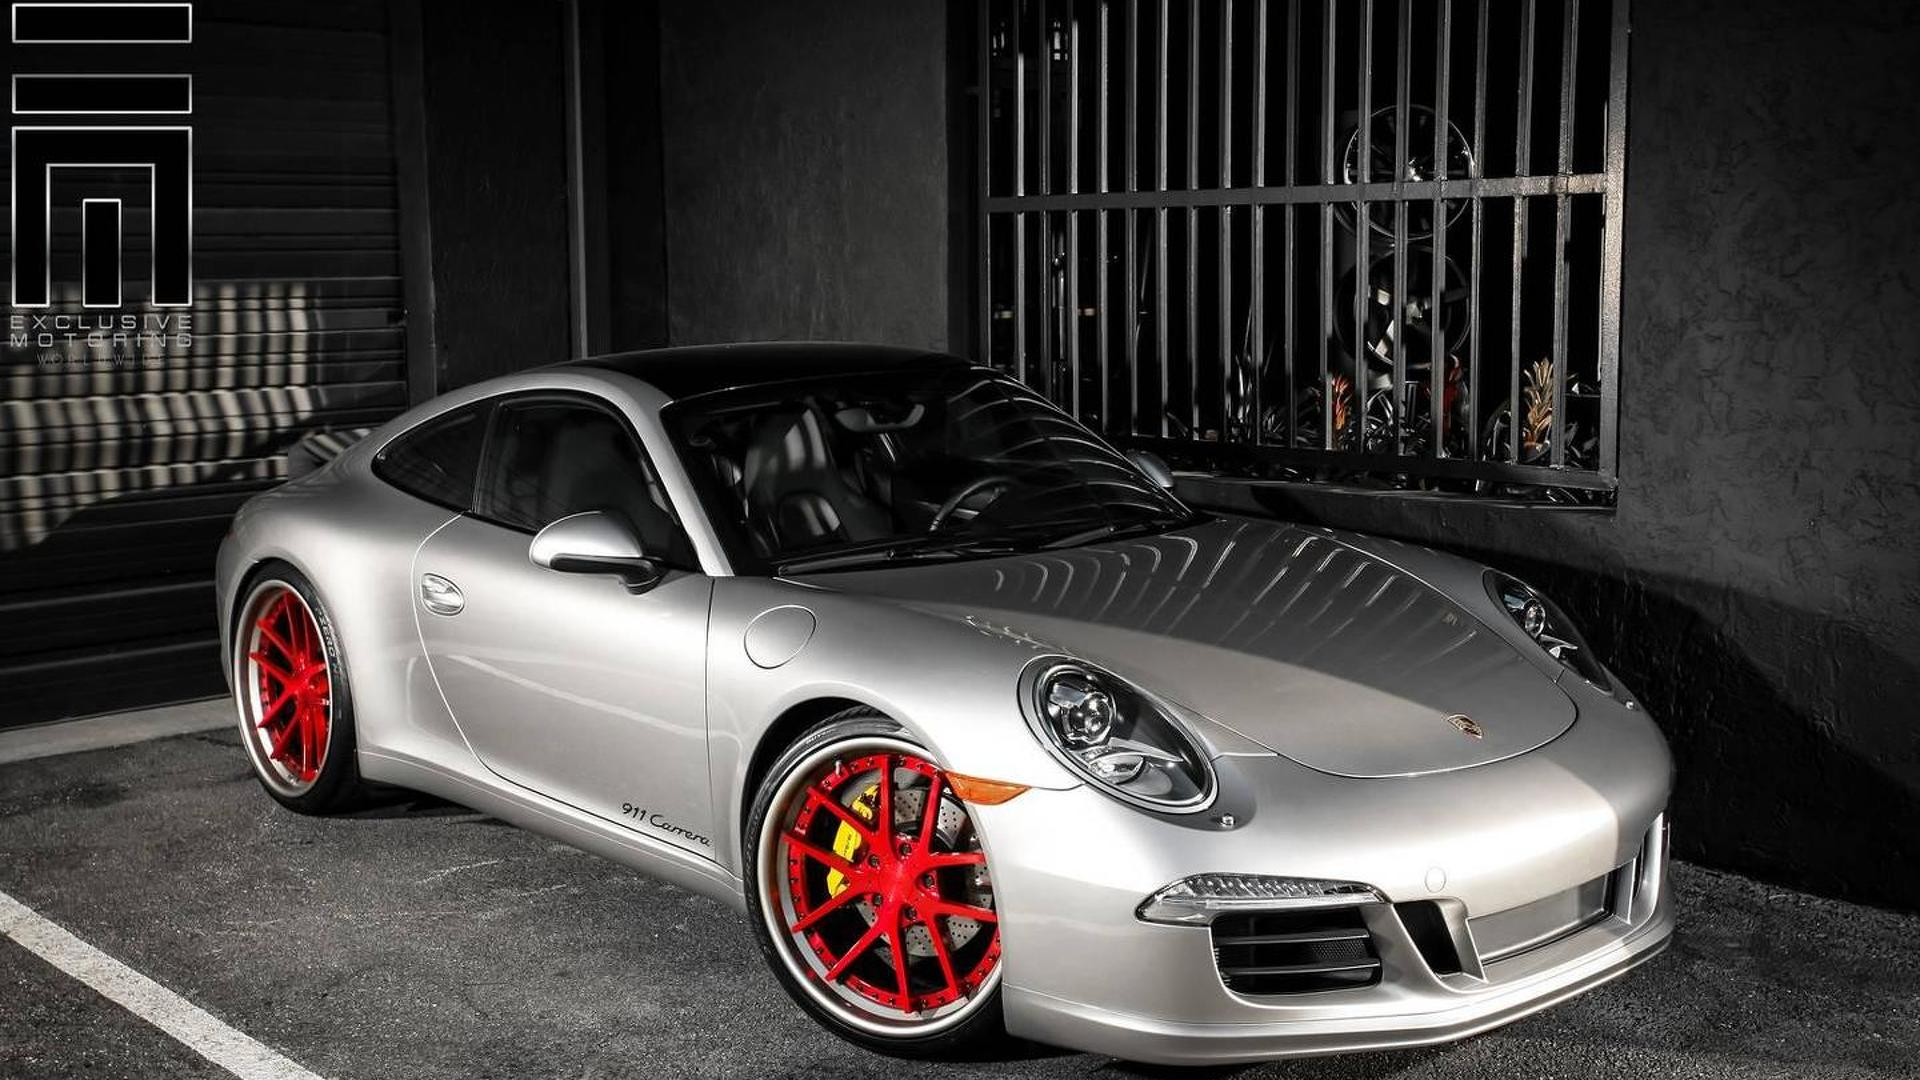 Porsche 911 Carrera gets minor makeover from Exclusive Motoring